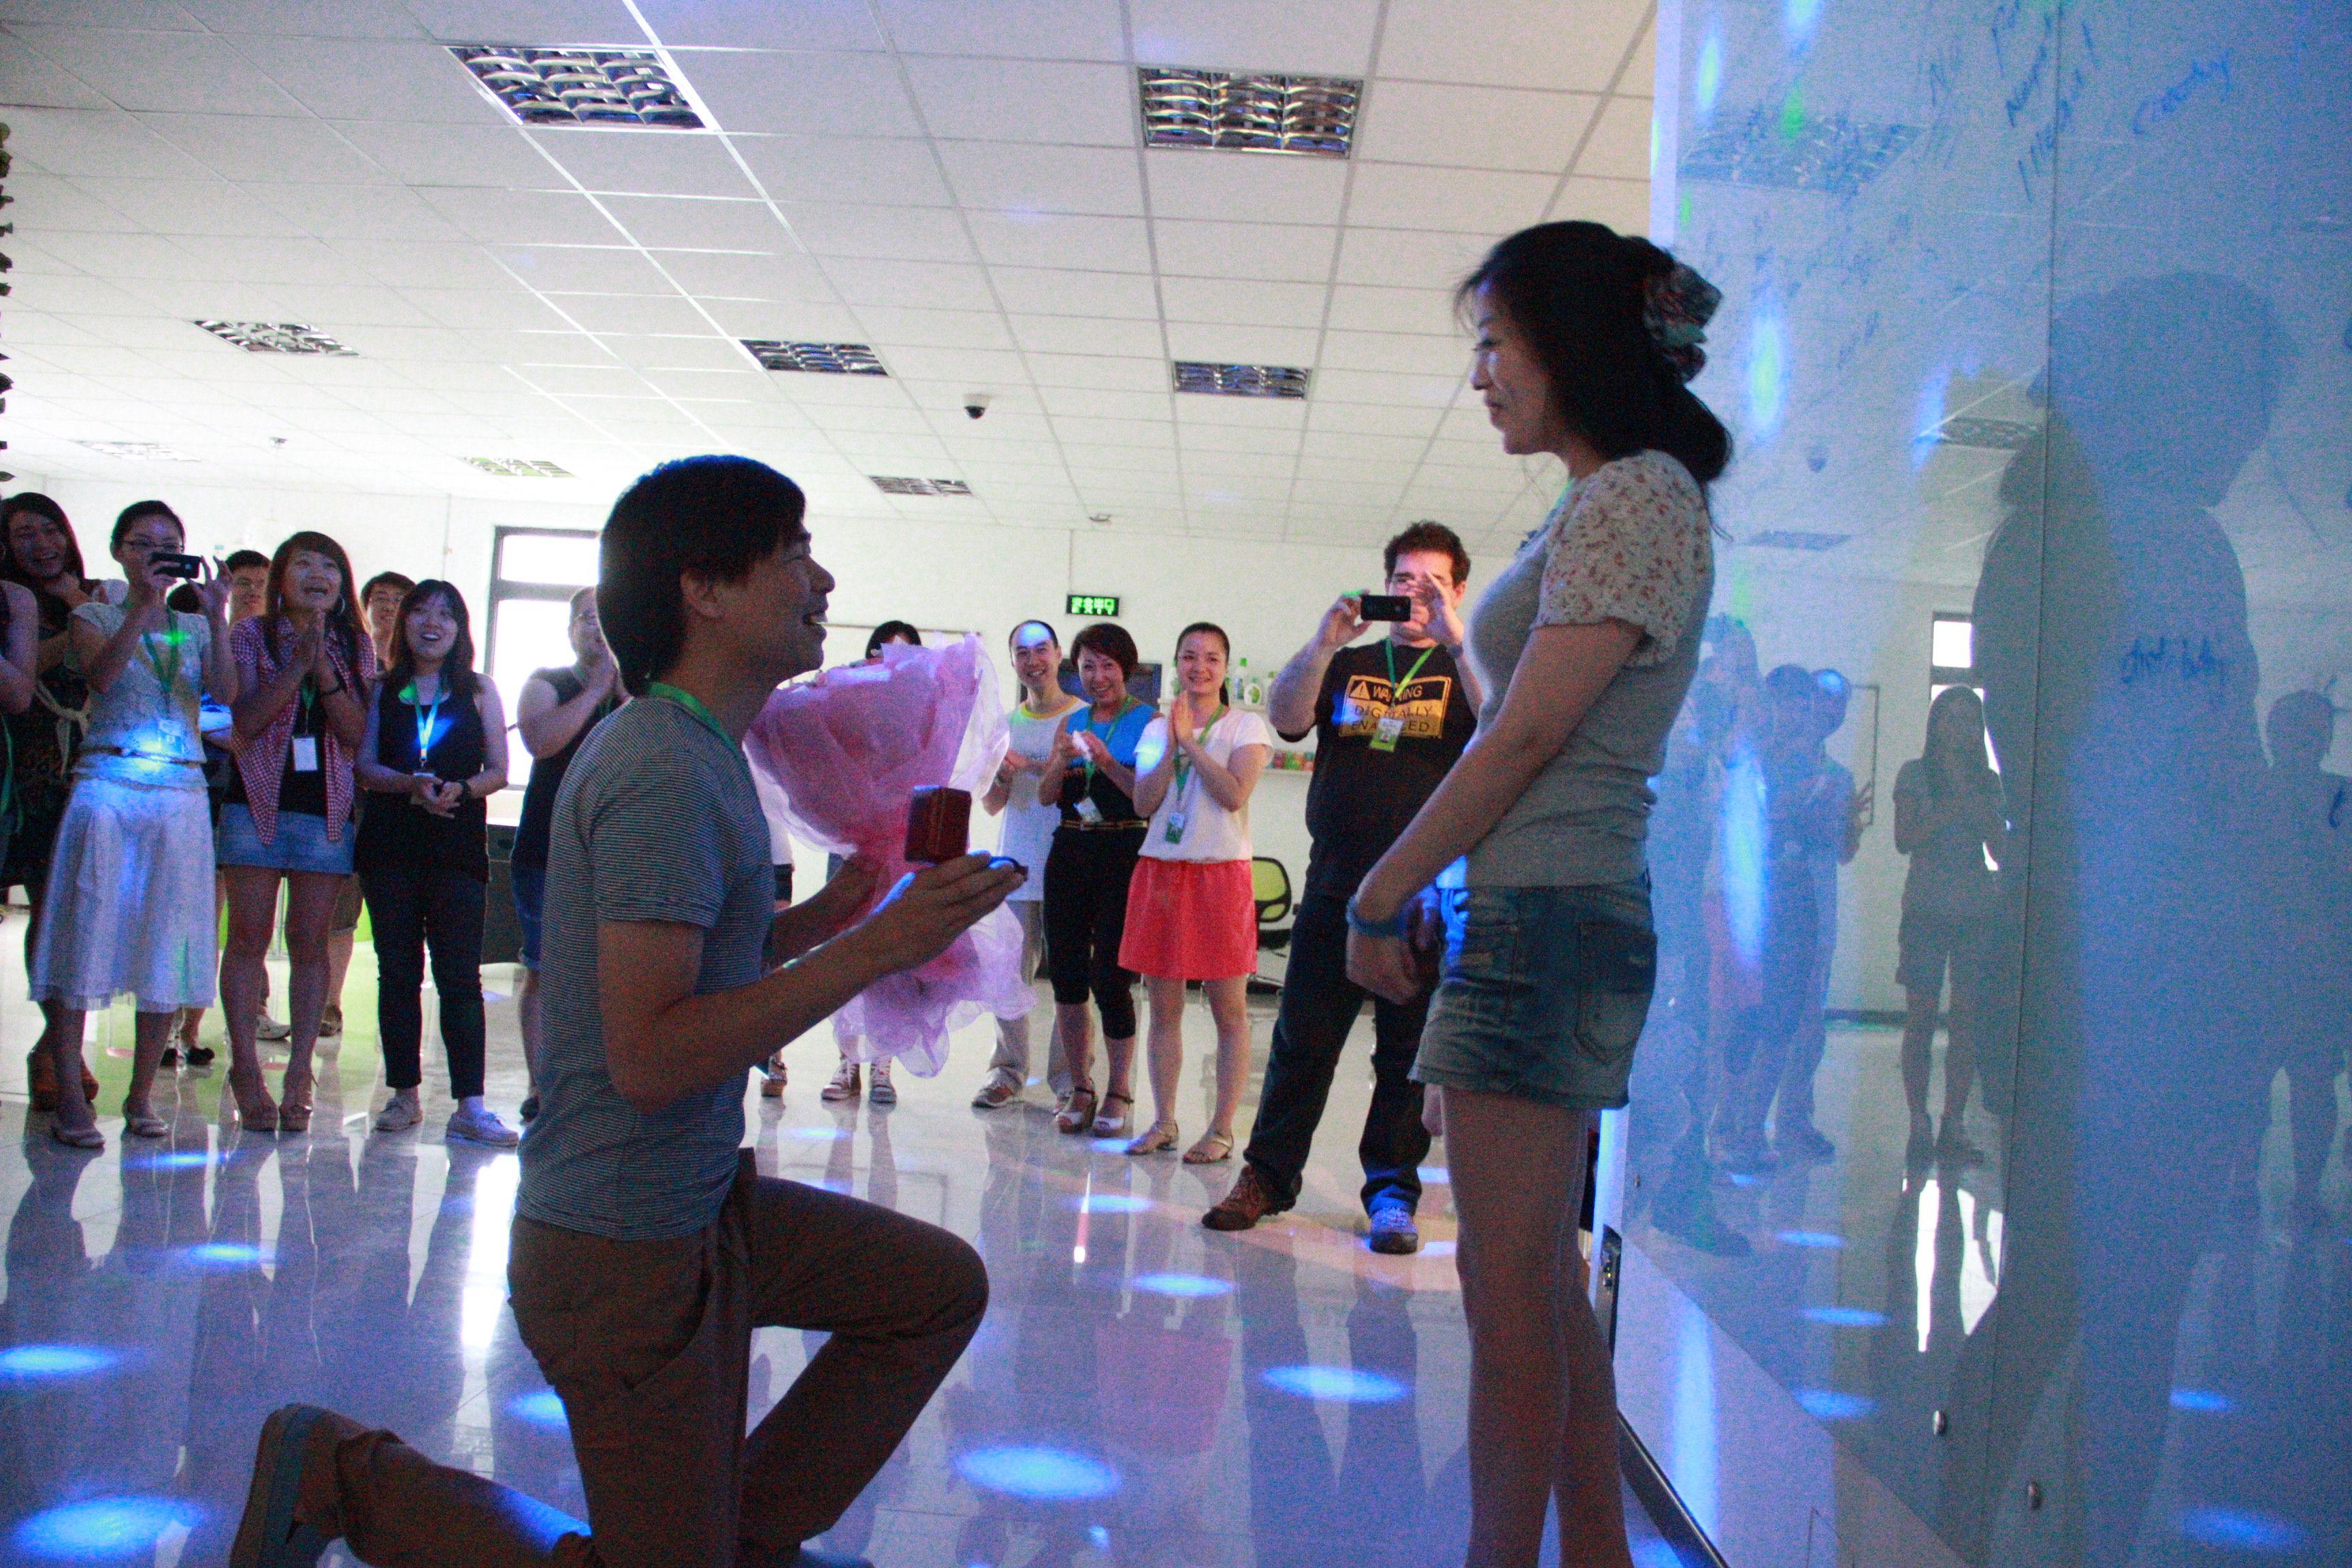 Dean proposing to Fulin